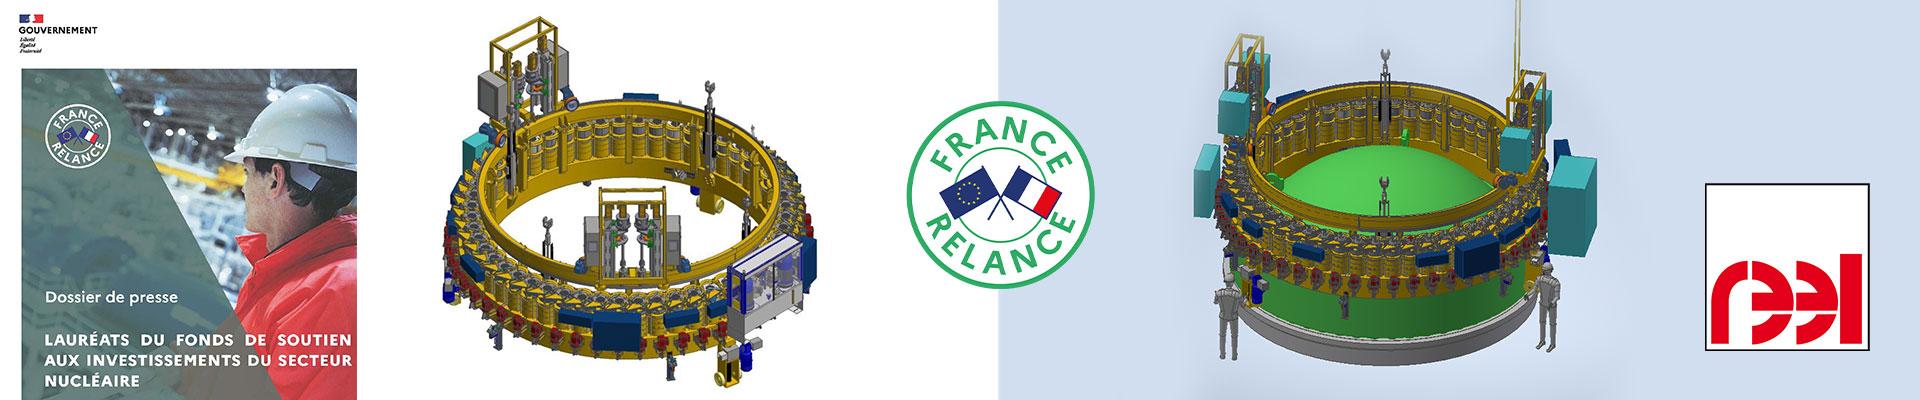 REEL Nuclear innovation France Relance